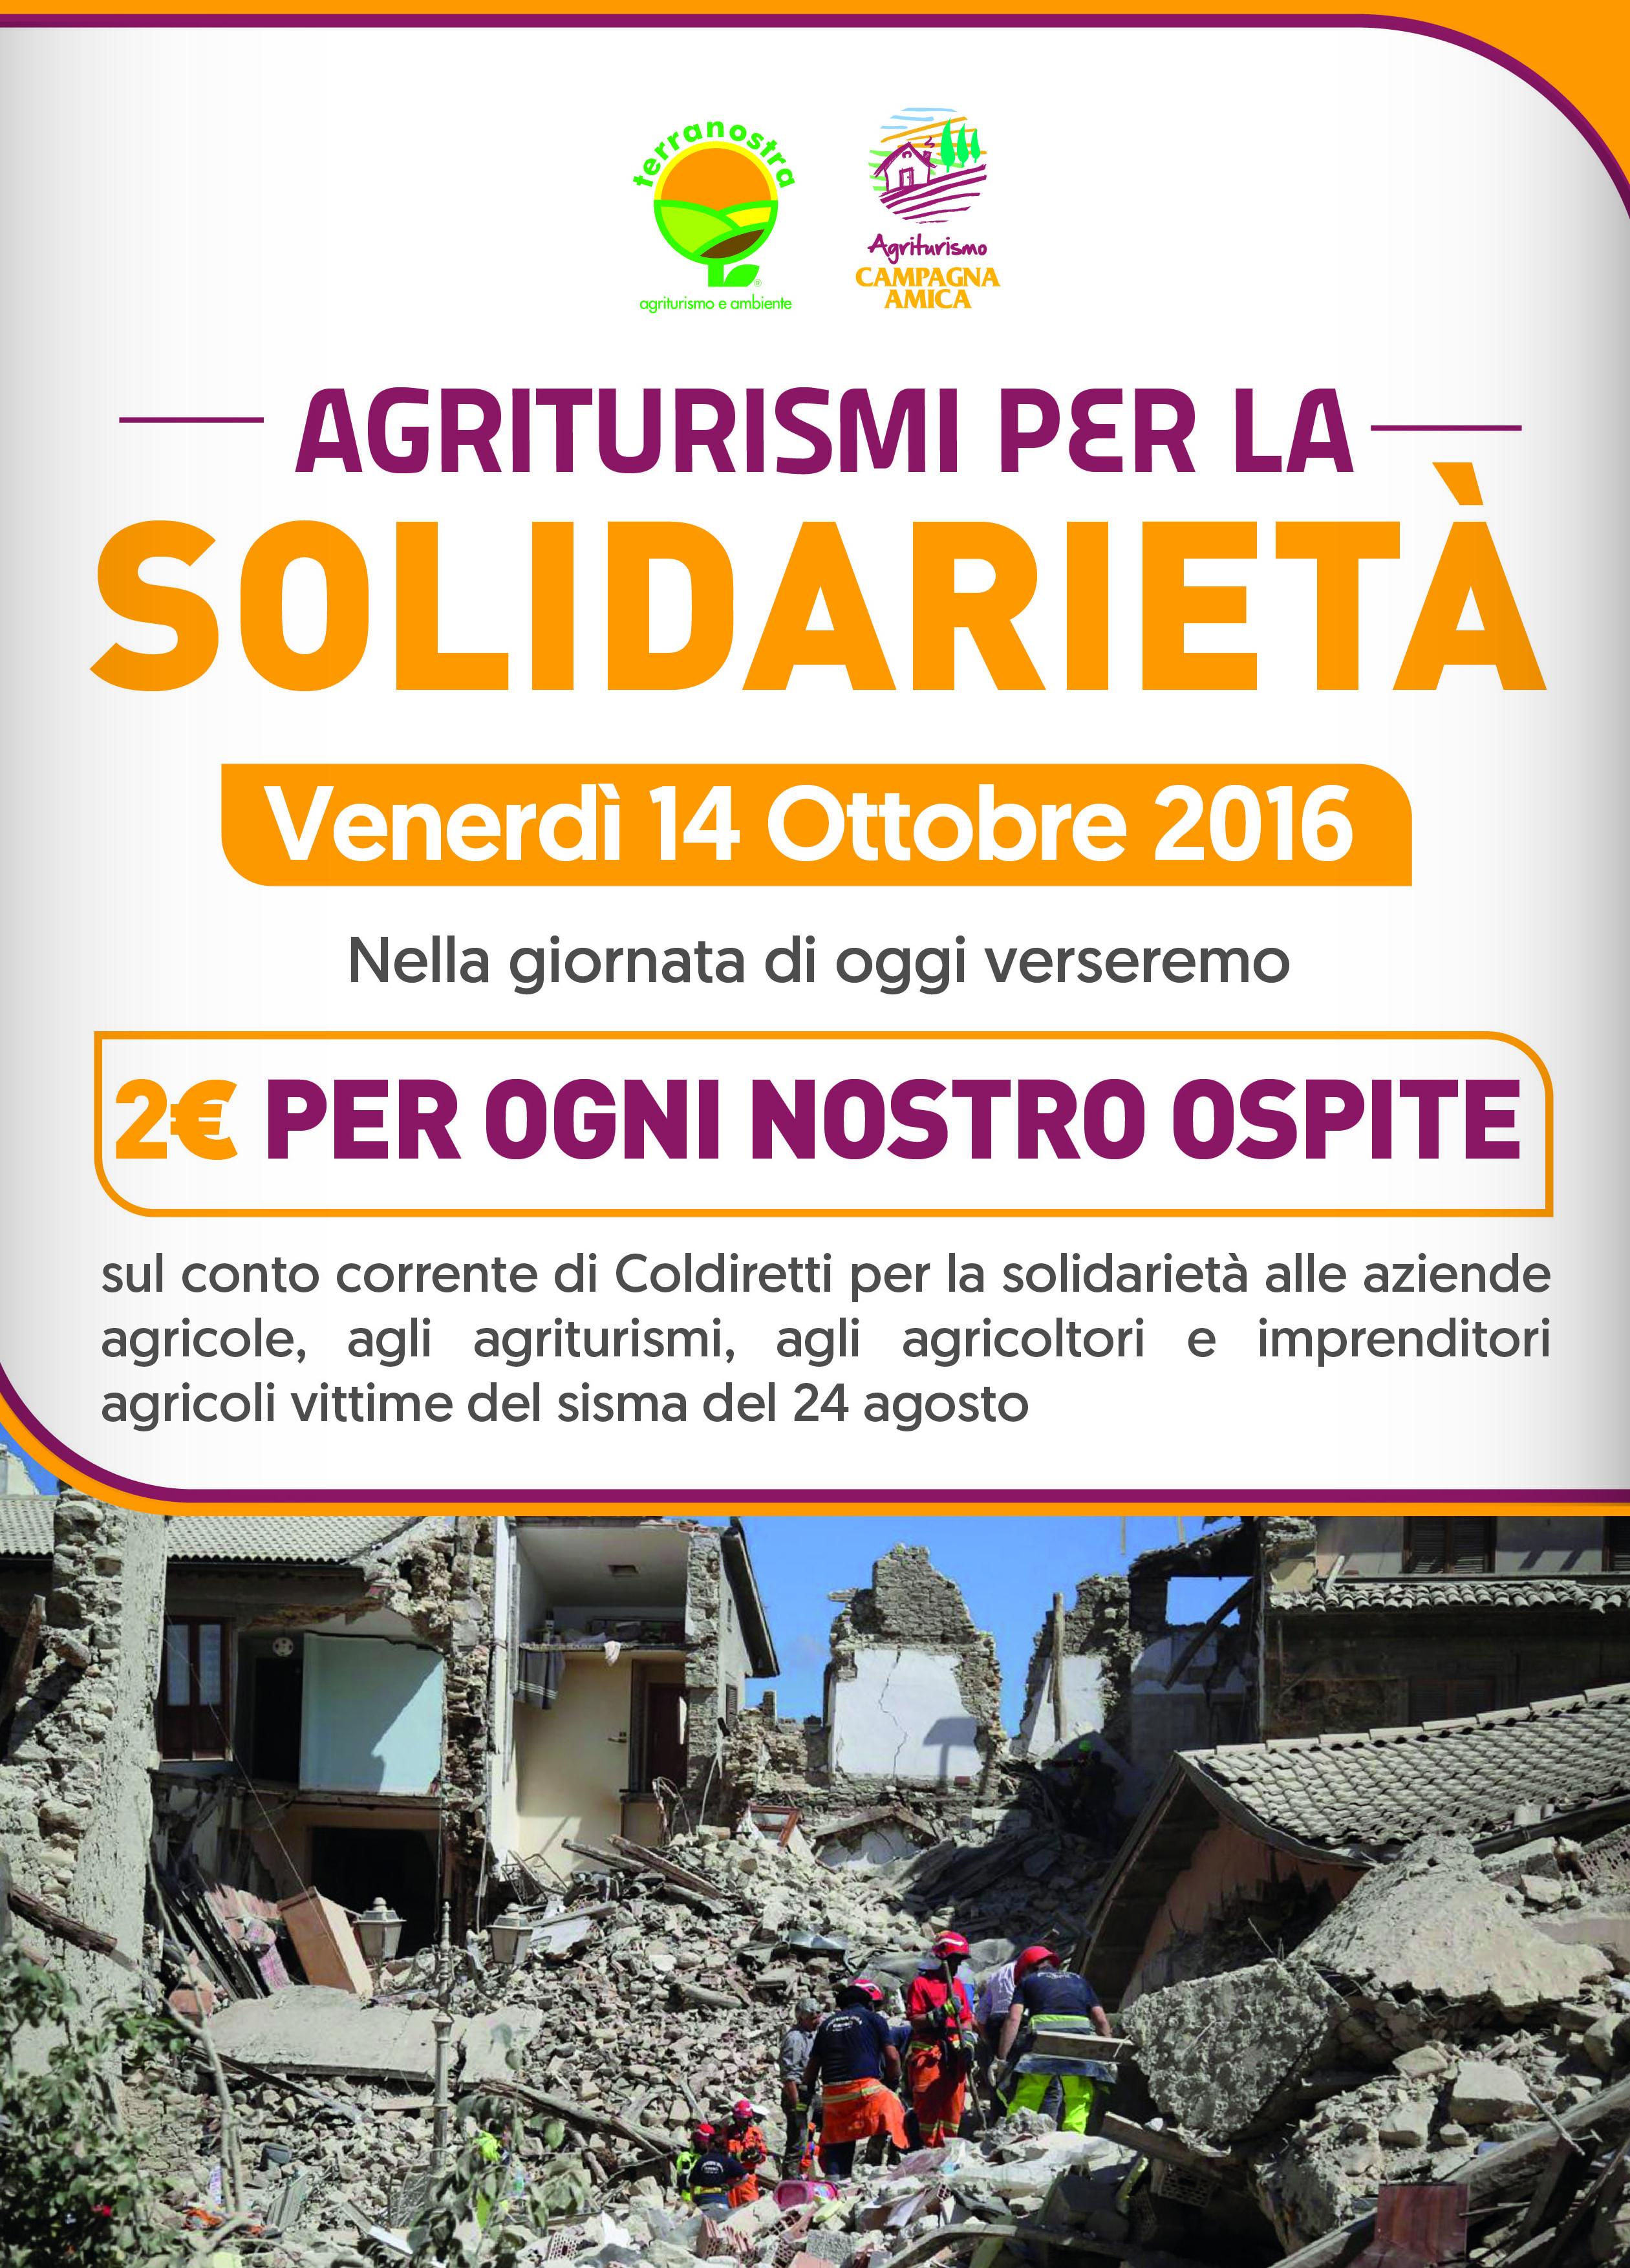 TERRANOSTRA_Agriturismi solidarietà_prova 2